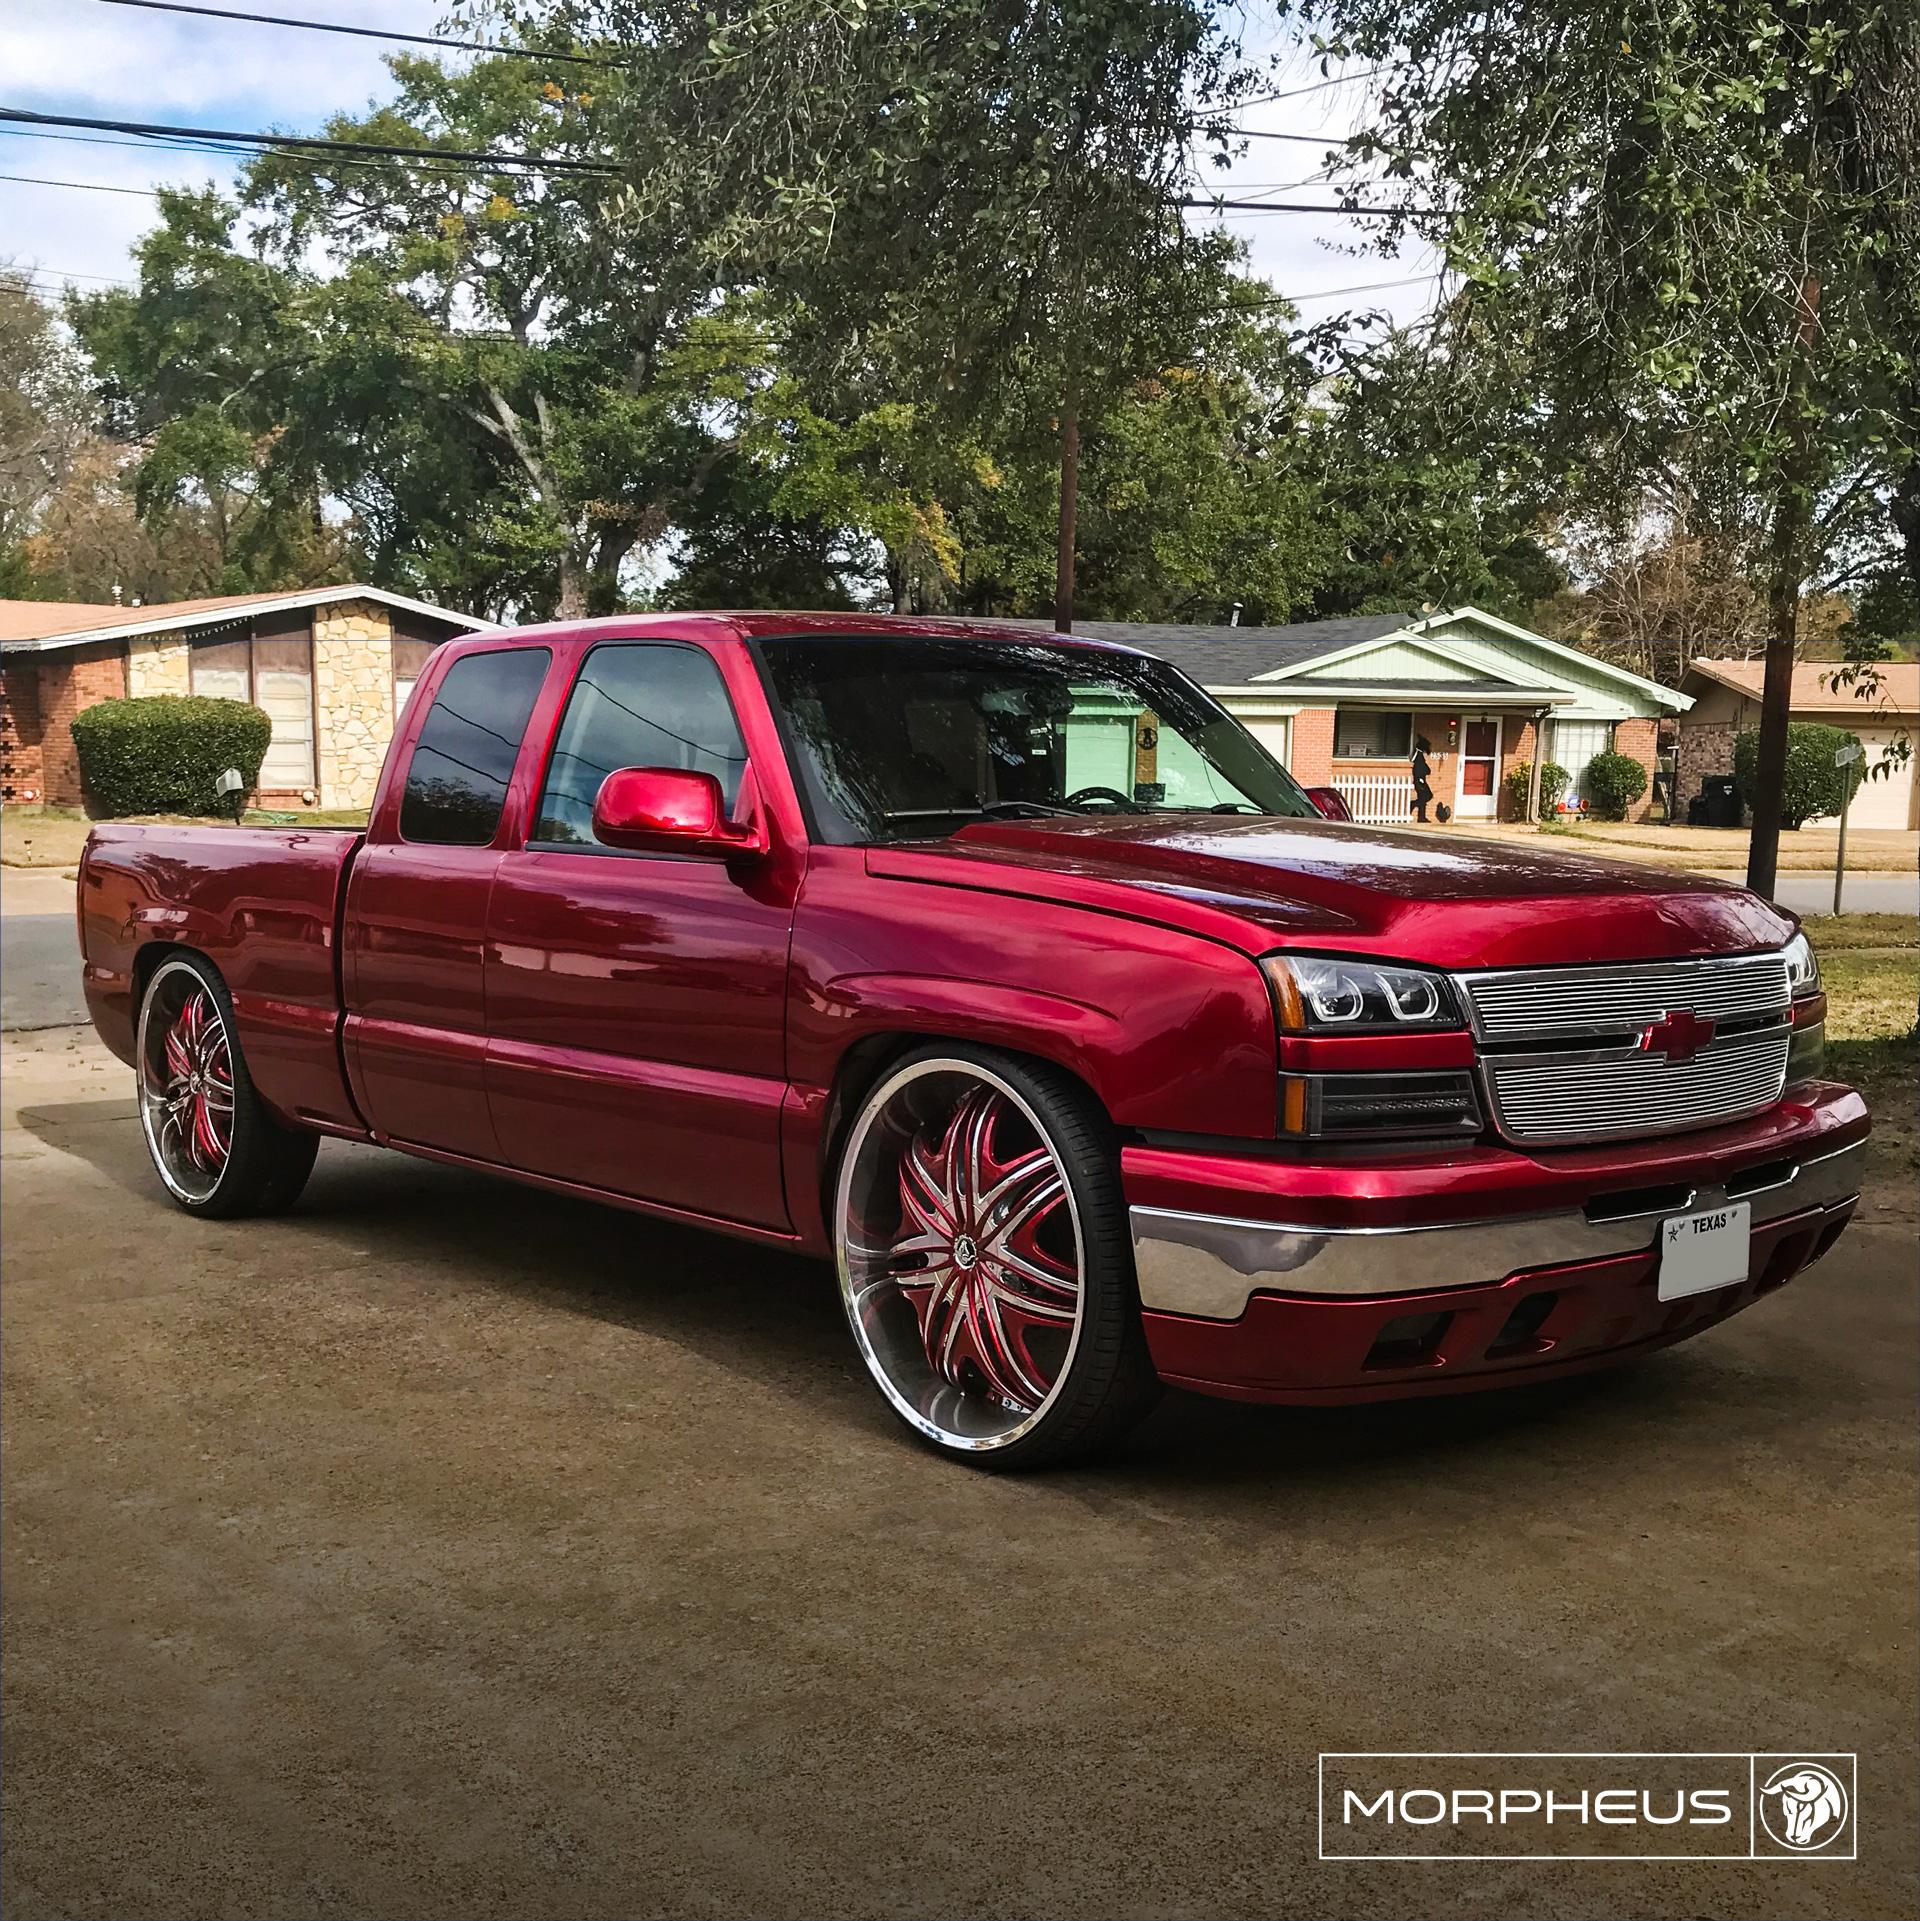 Diablo Wheels - Morpheus on a Chevrolet Silverado 28s